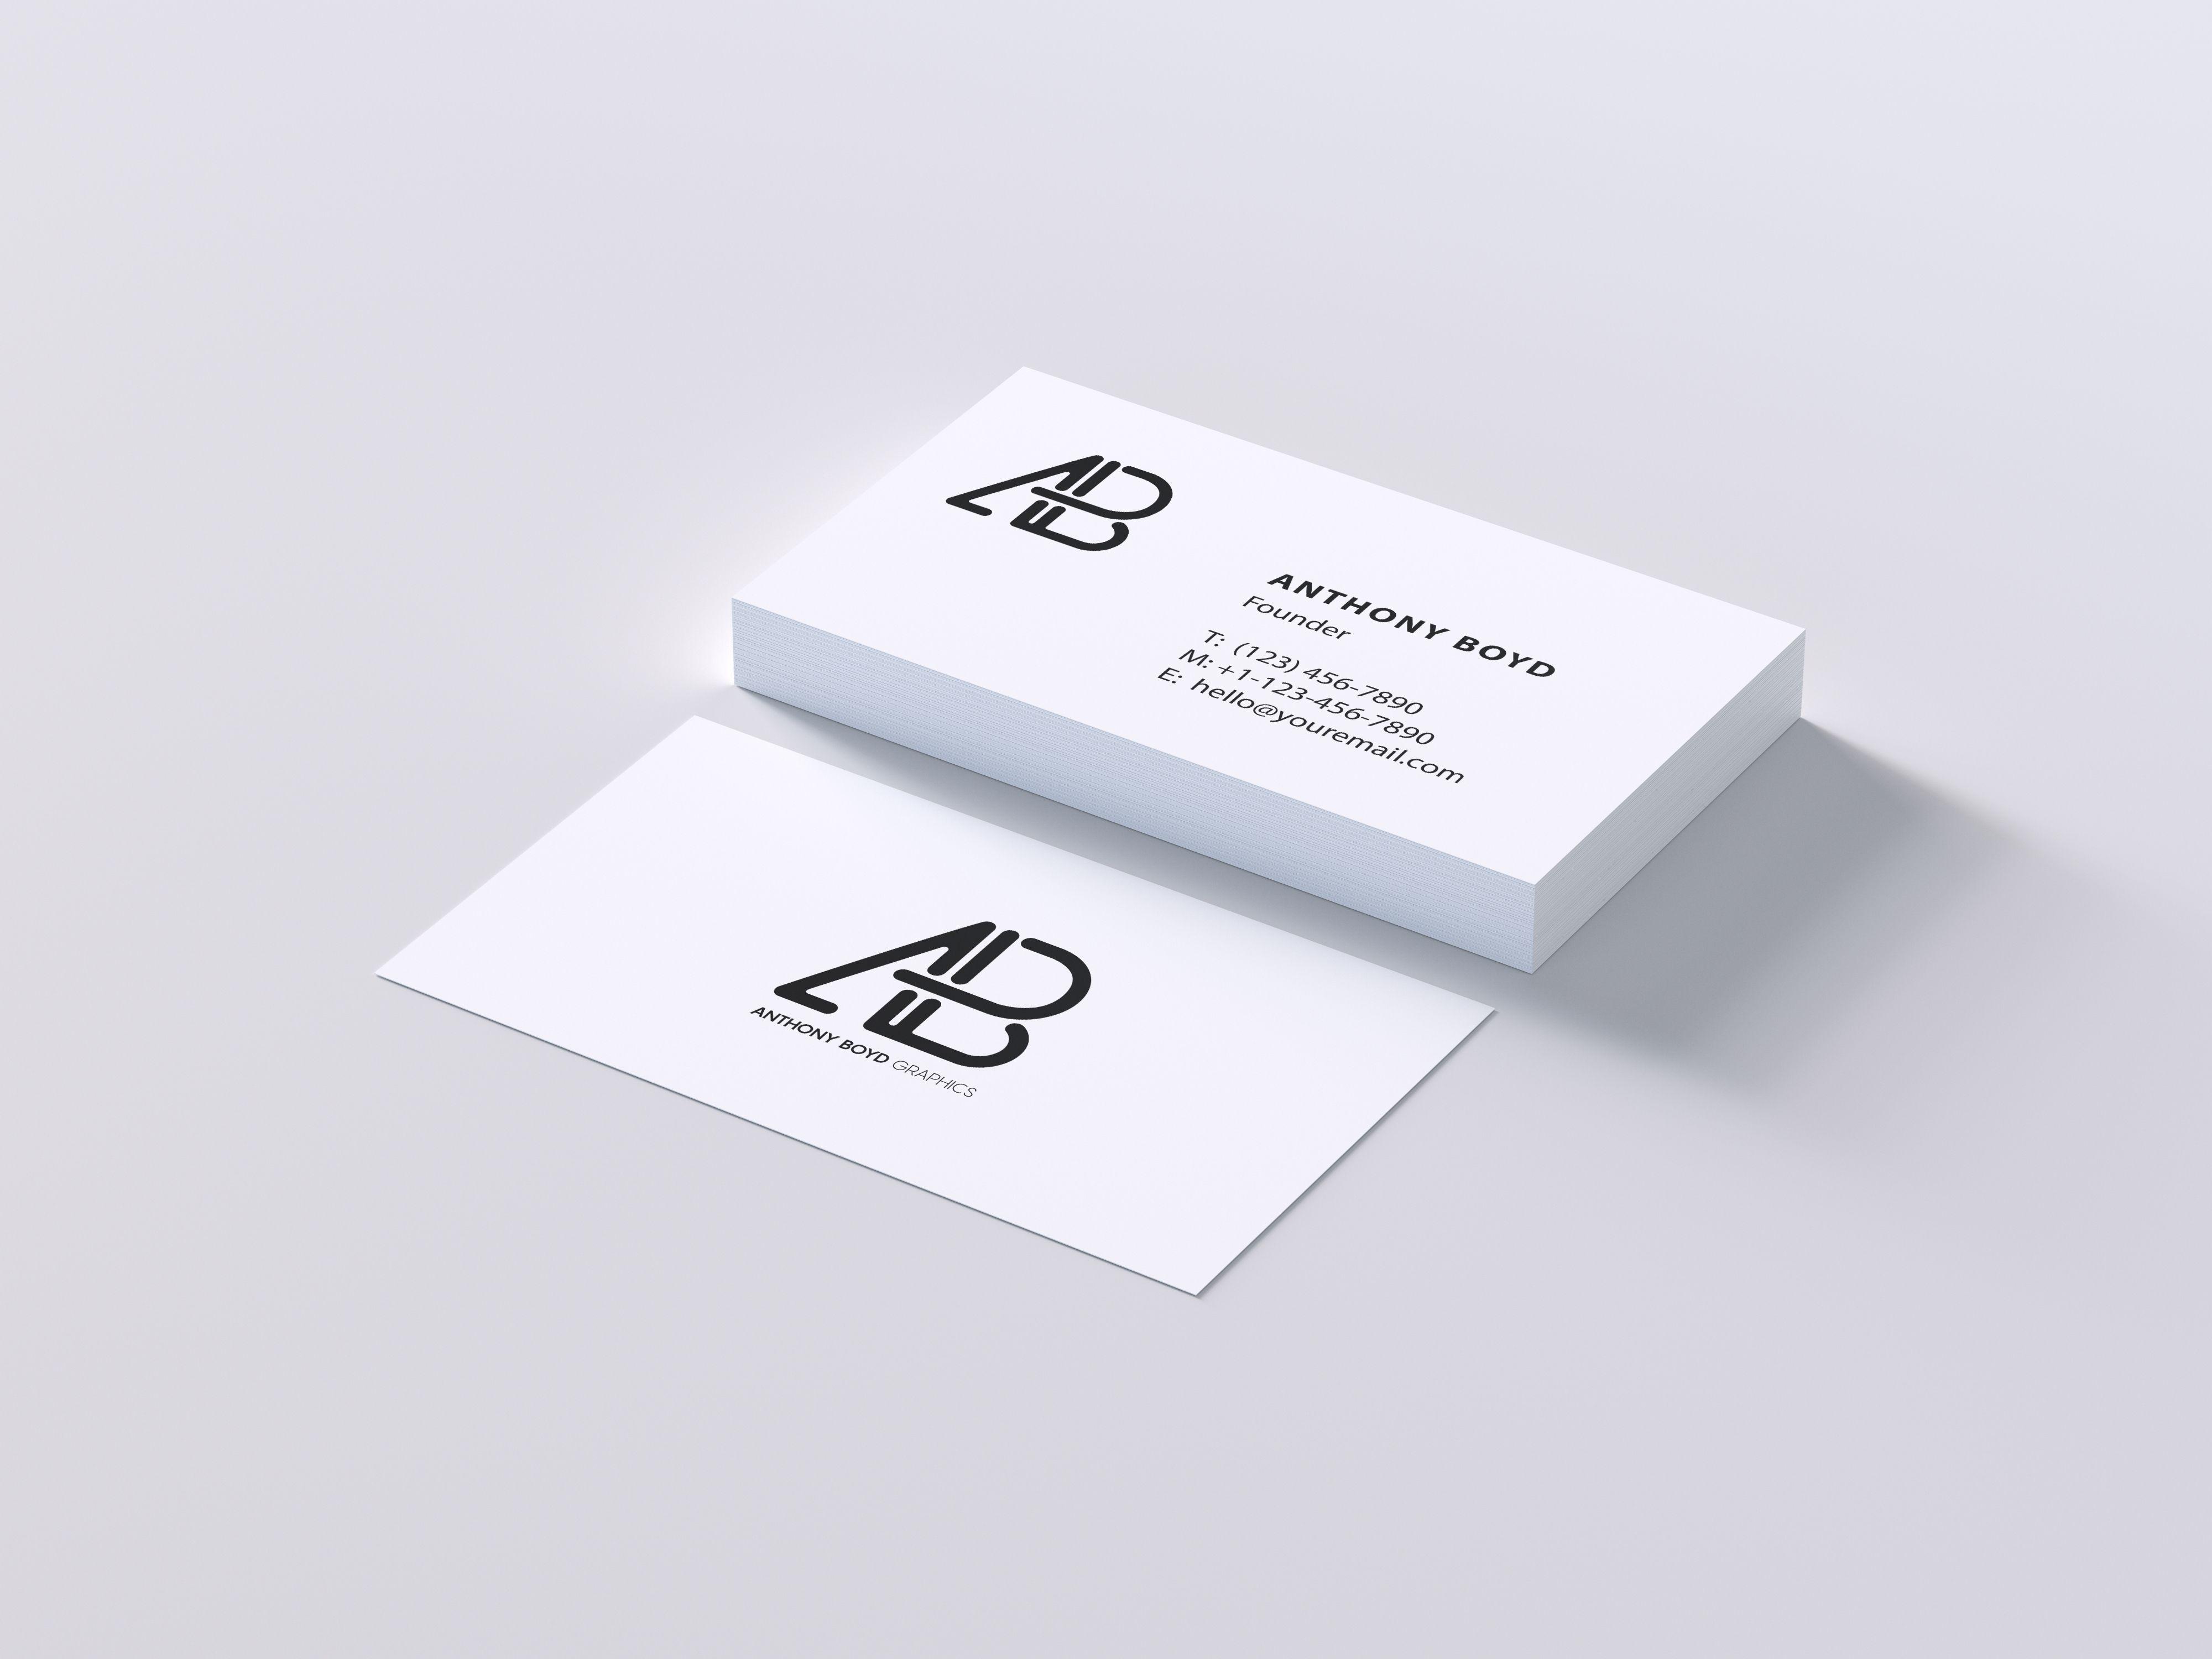 Free Psd Corporate Modern Business Card Psd Set Business Cards Online Business Card Psd Freelance Business Card